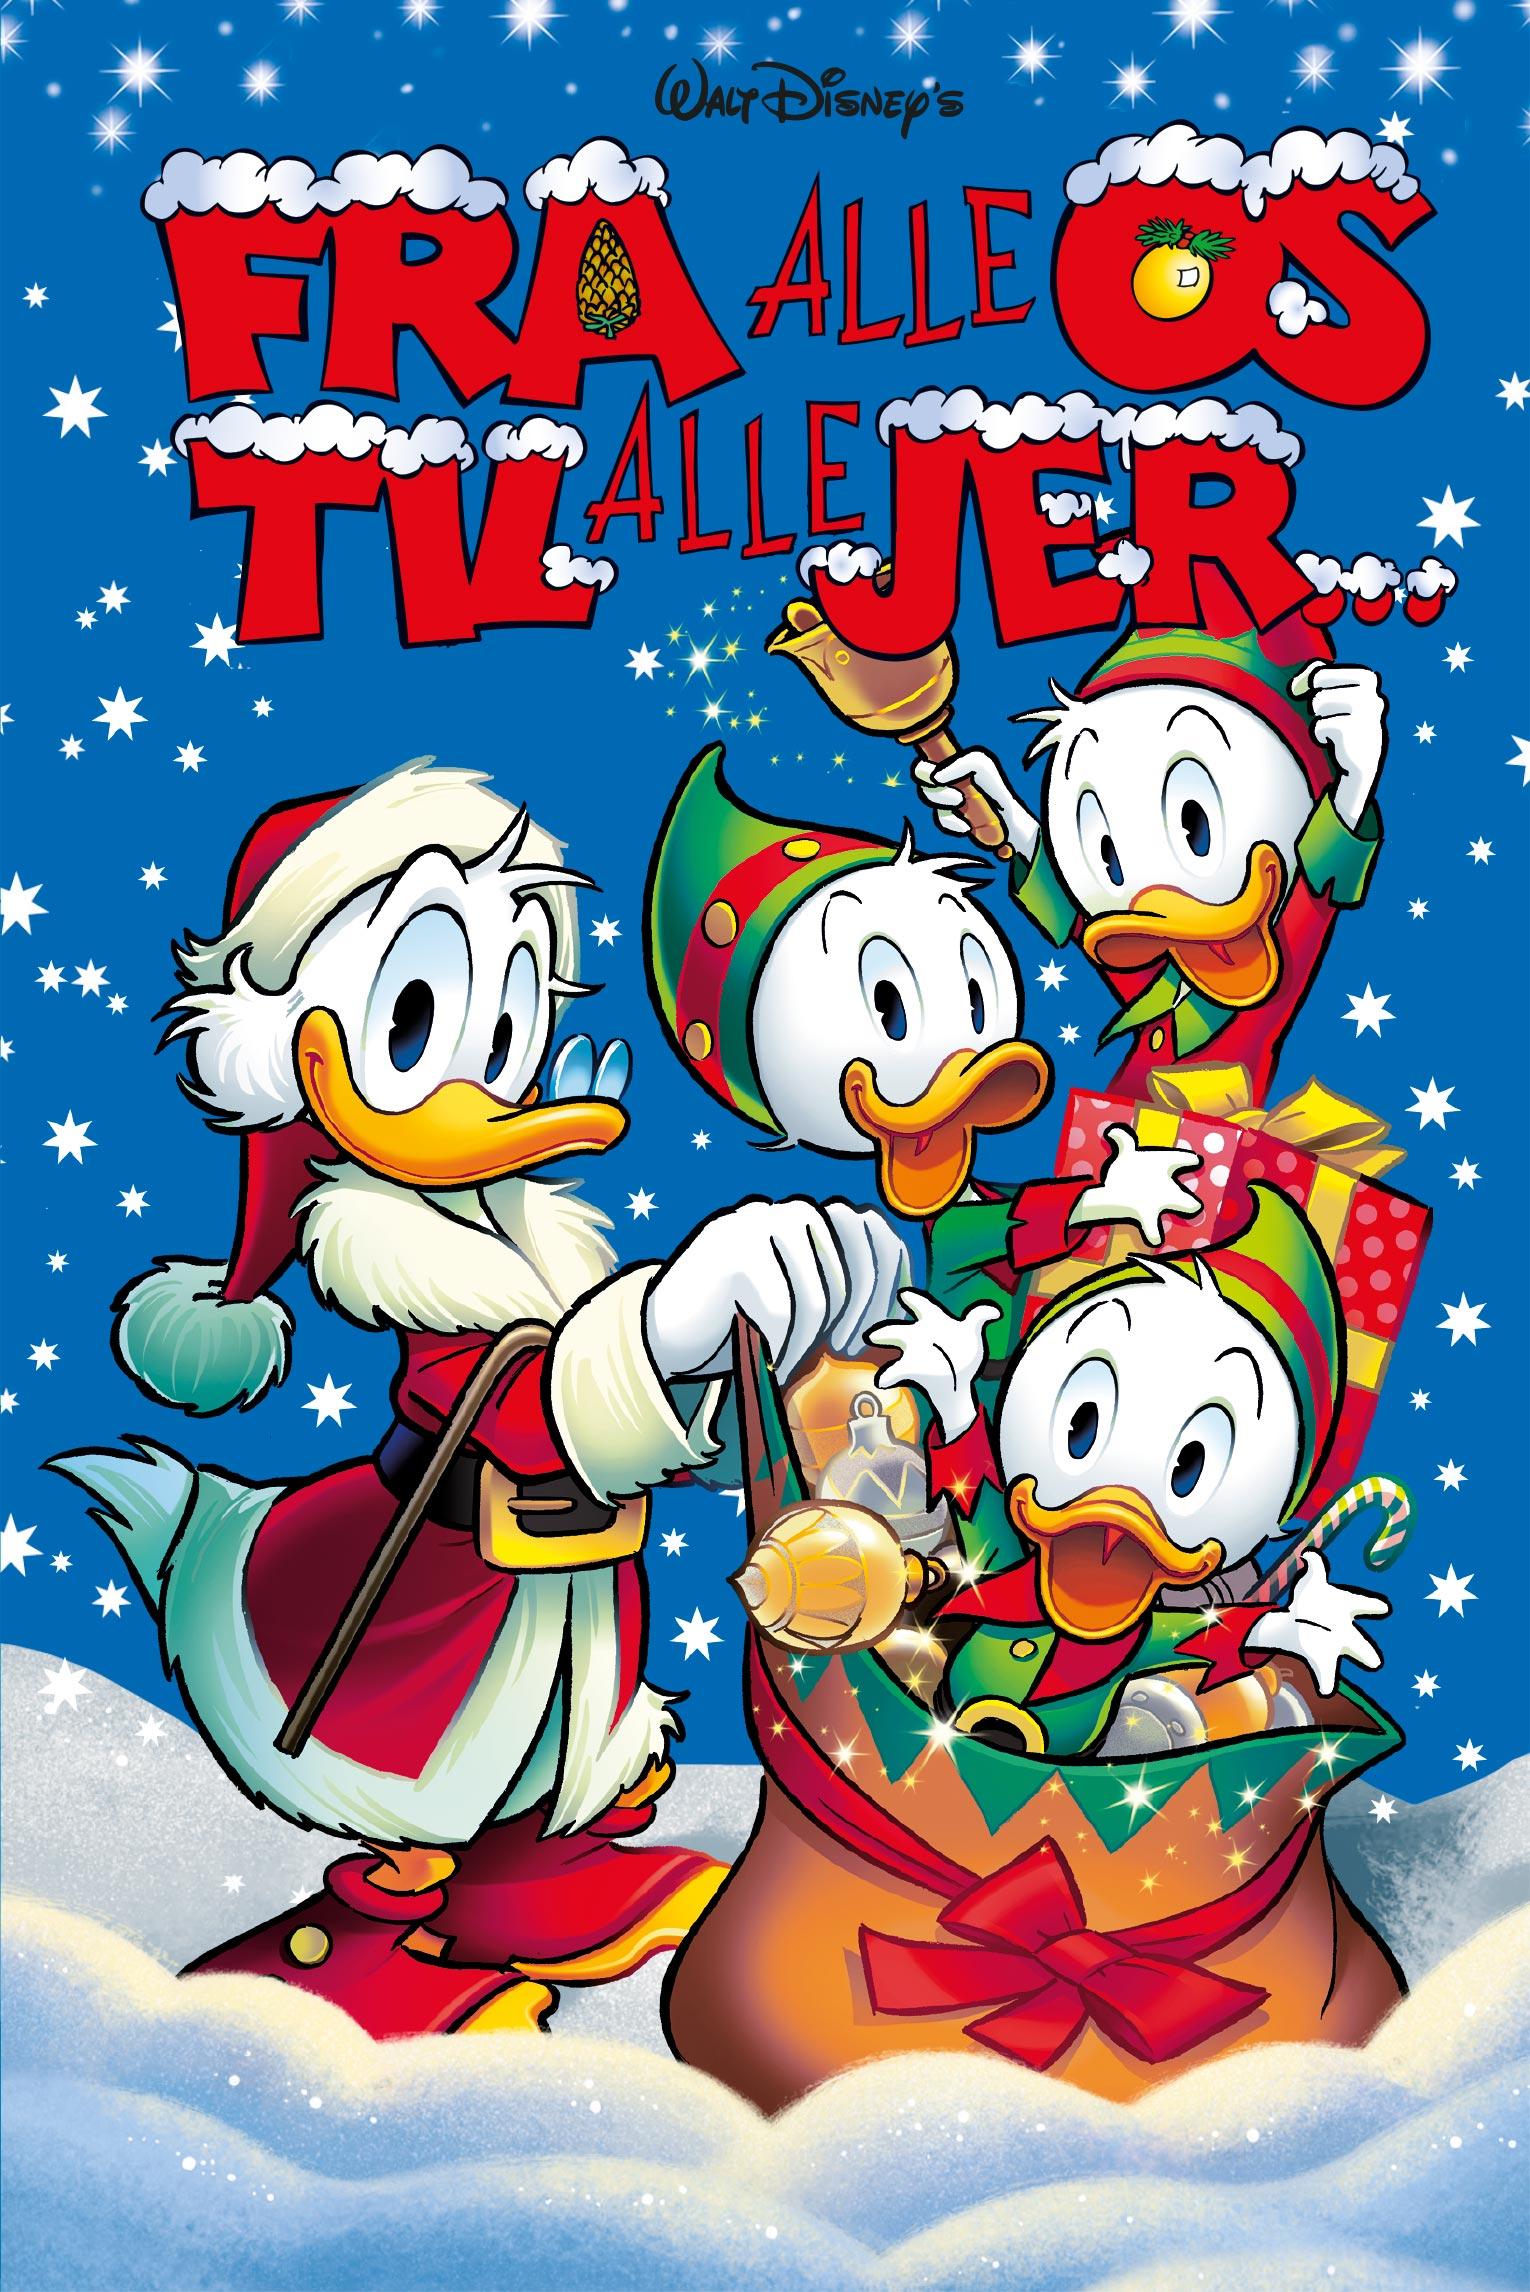 Disneys Juleklassikere 28 - Disney - Bøger - Story House Egmont - 9788793840300 - October 18, 2021